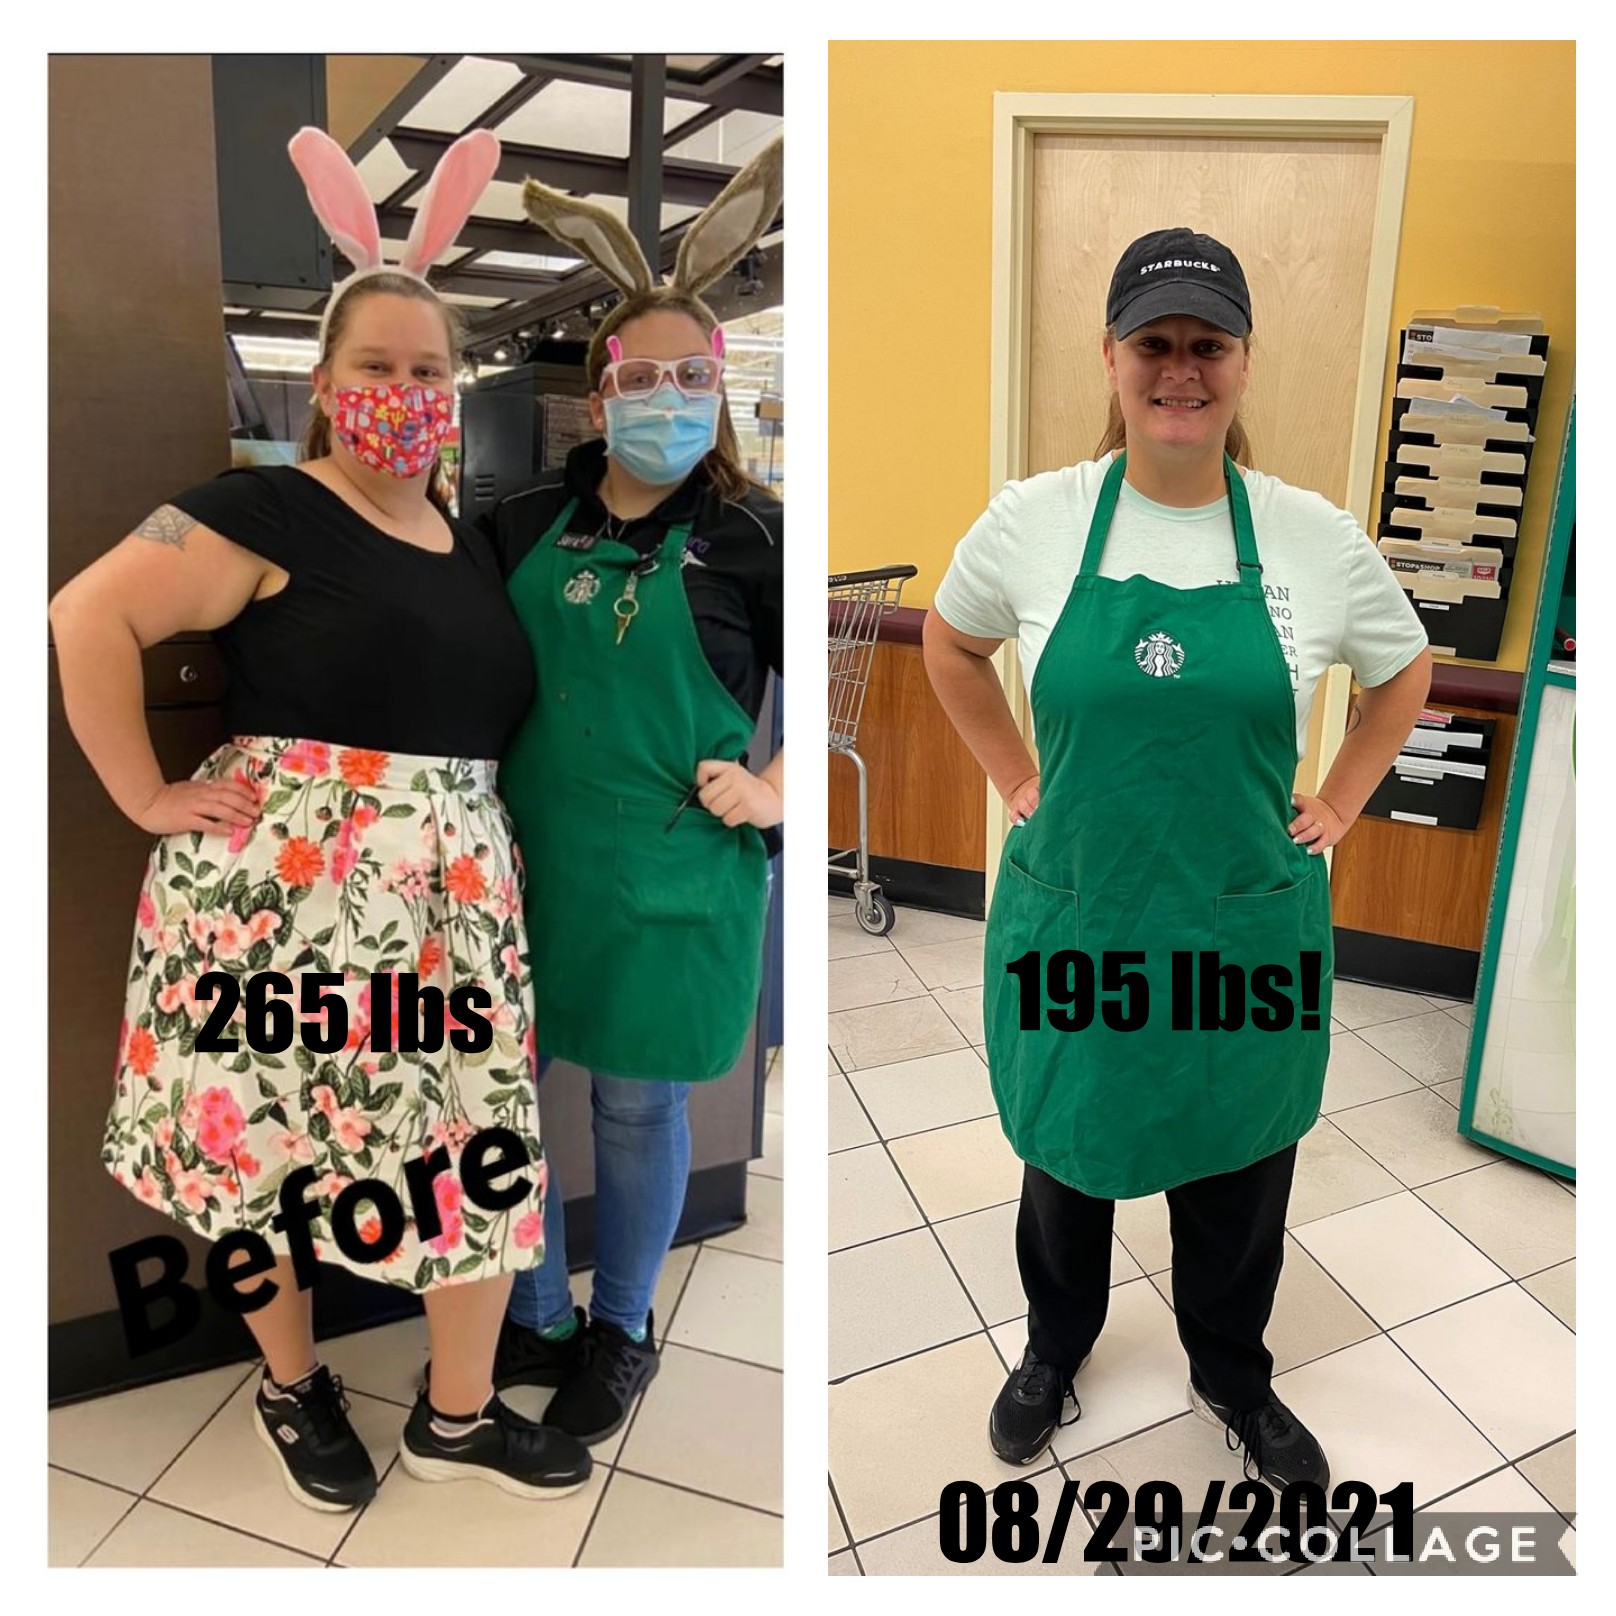 70 lbs Fat Loss 5 foot 6 Female 265 lbs to 195 lbs